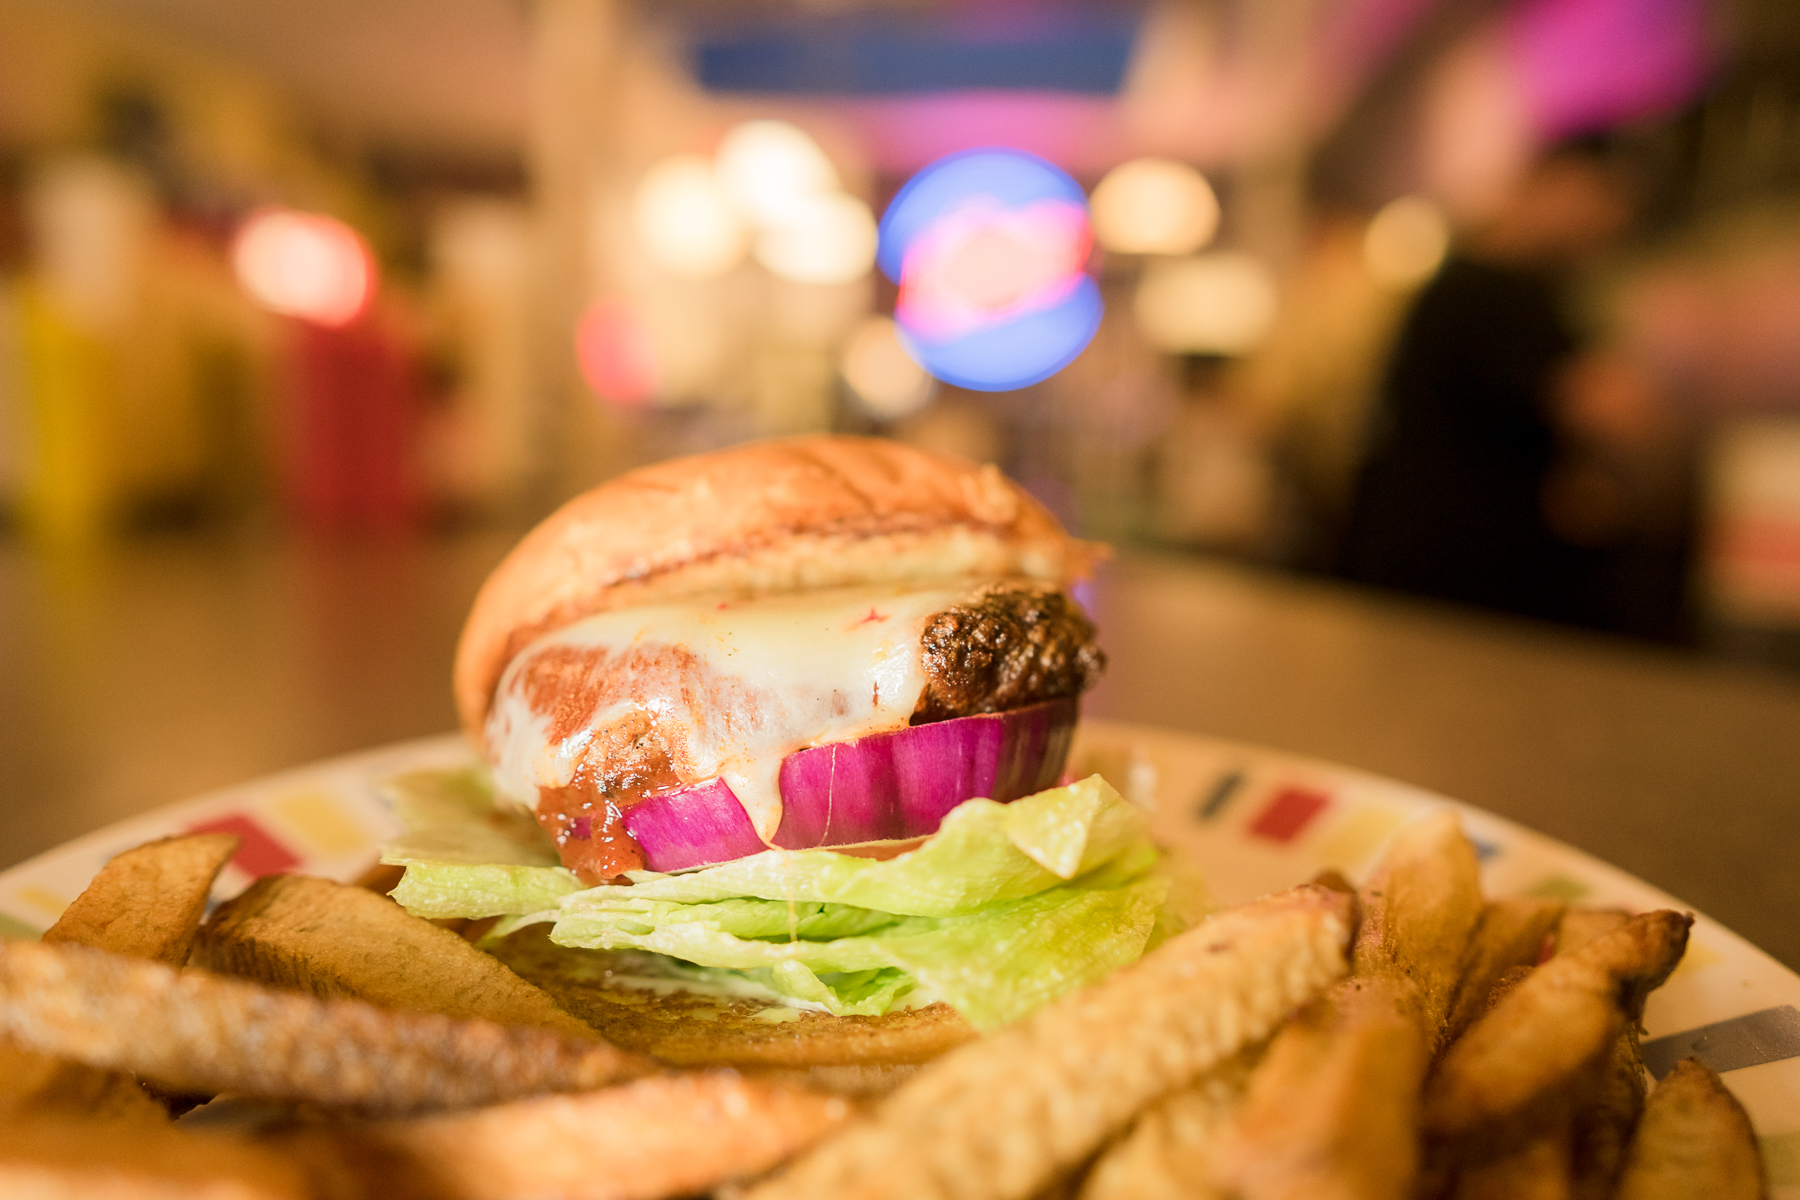 A7ii_20161020_7648, paul bellinger billings montana headshot photographer, burger dive fb.jpg